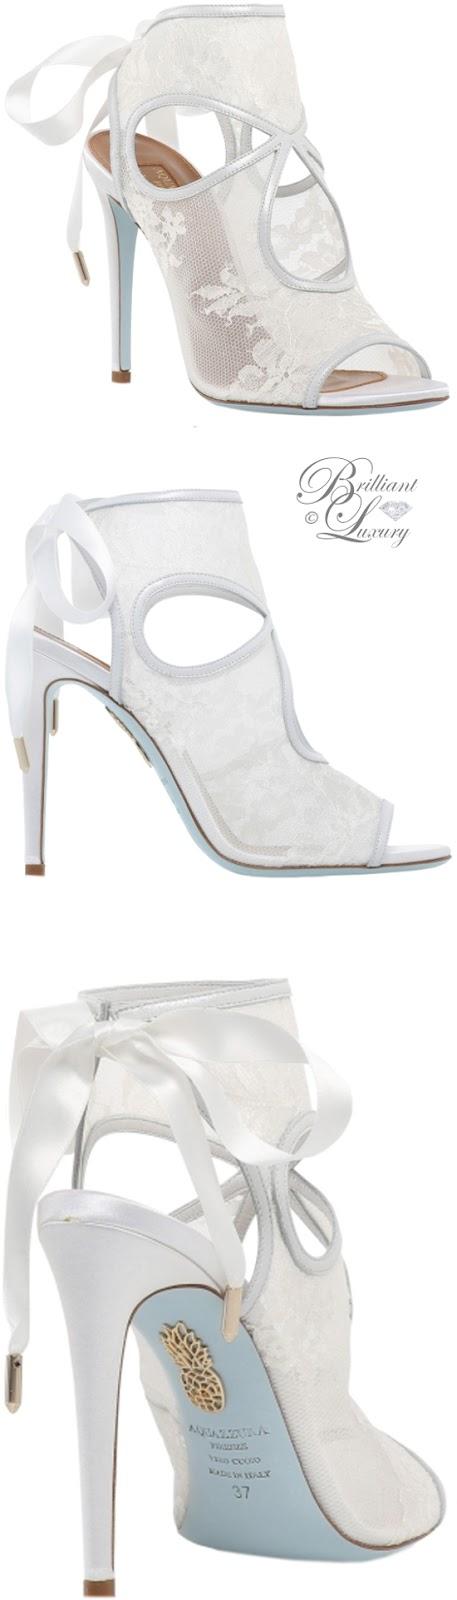 Brilliant Luxury ♦ Aquazzura Sexy Thing Bridal Sandals